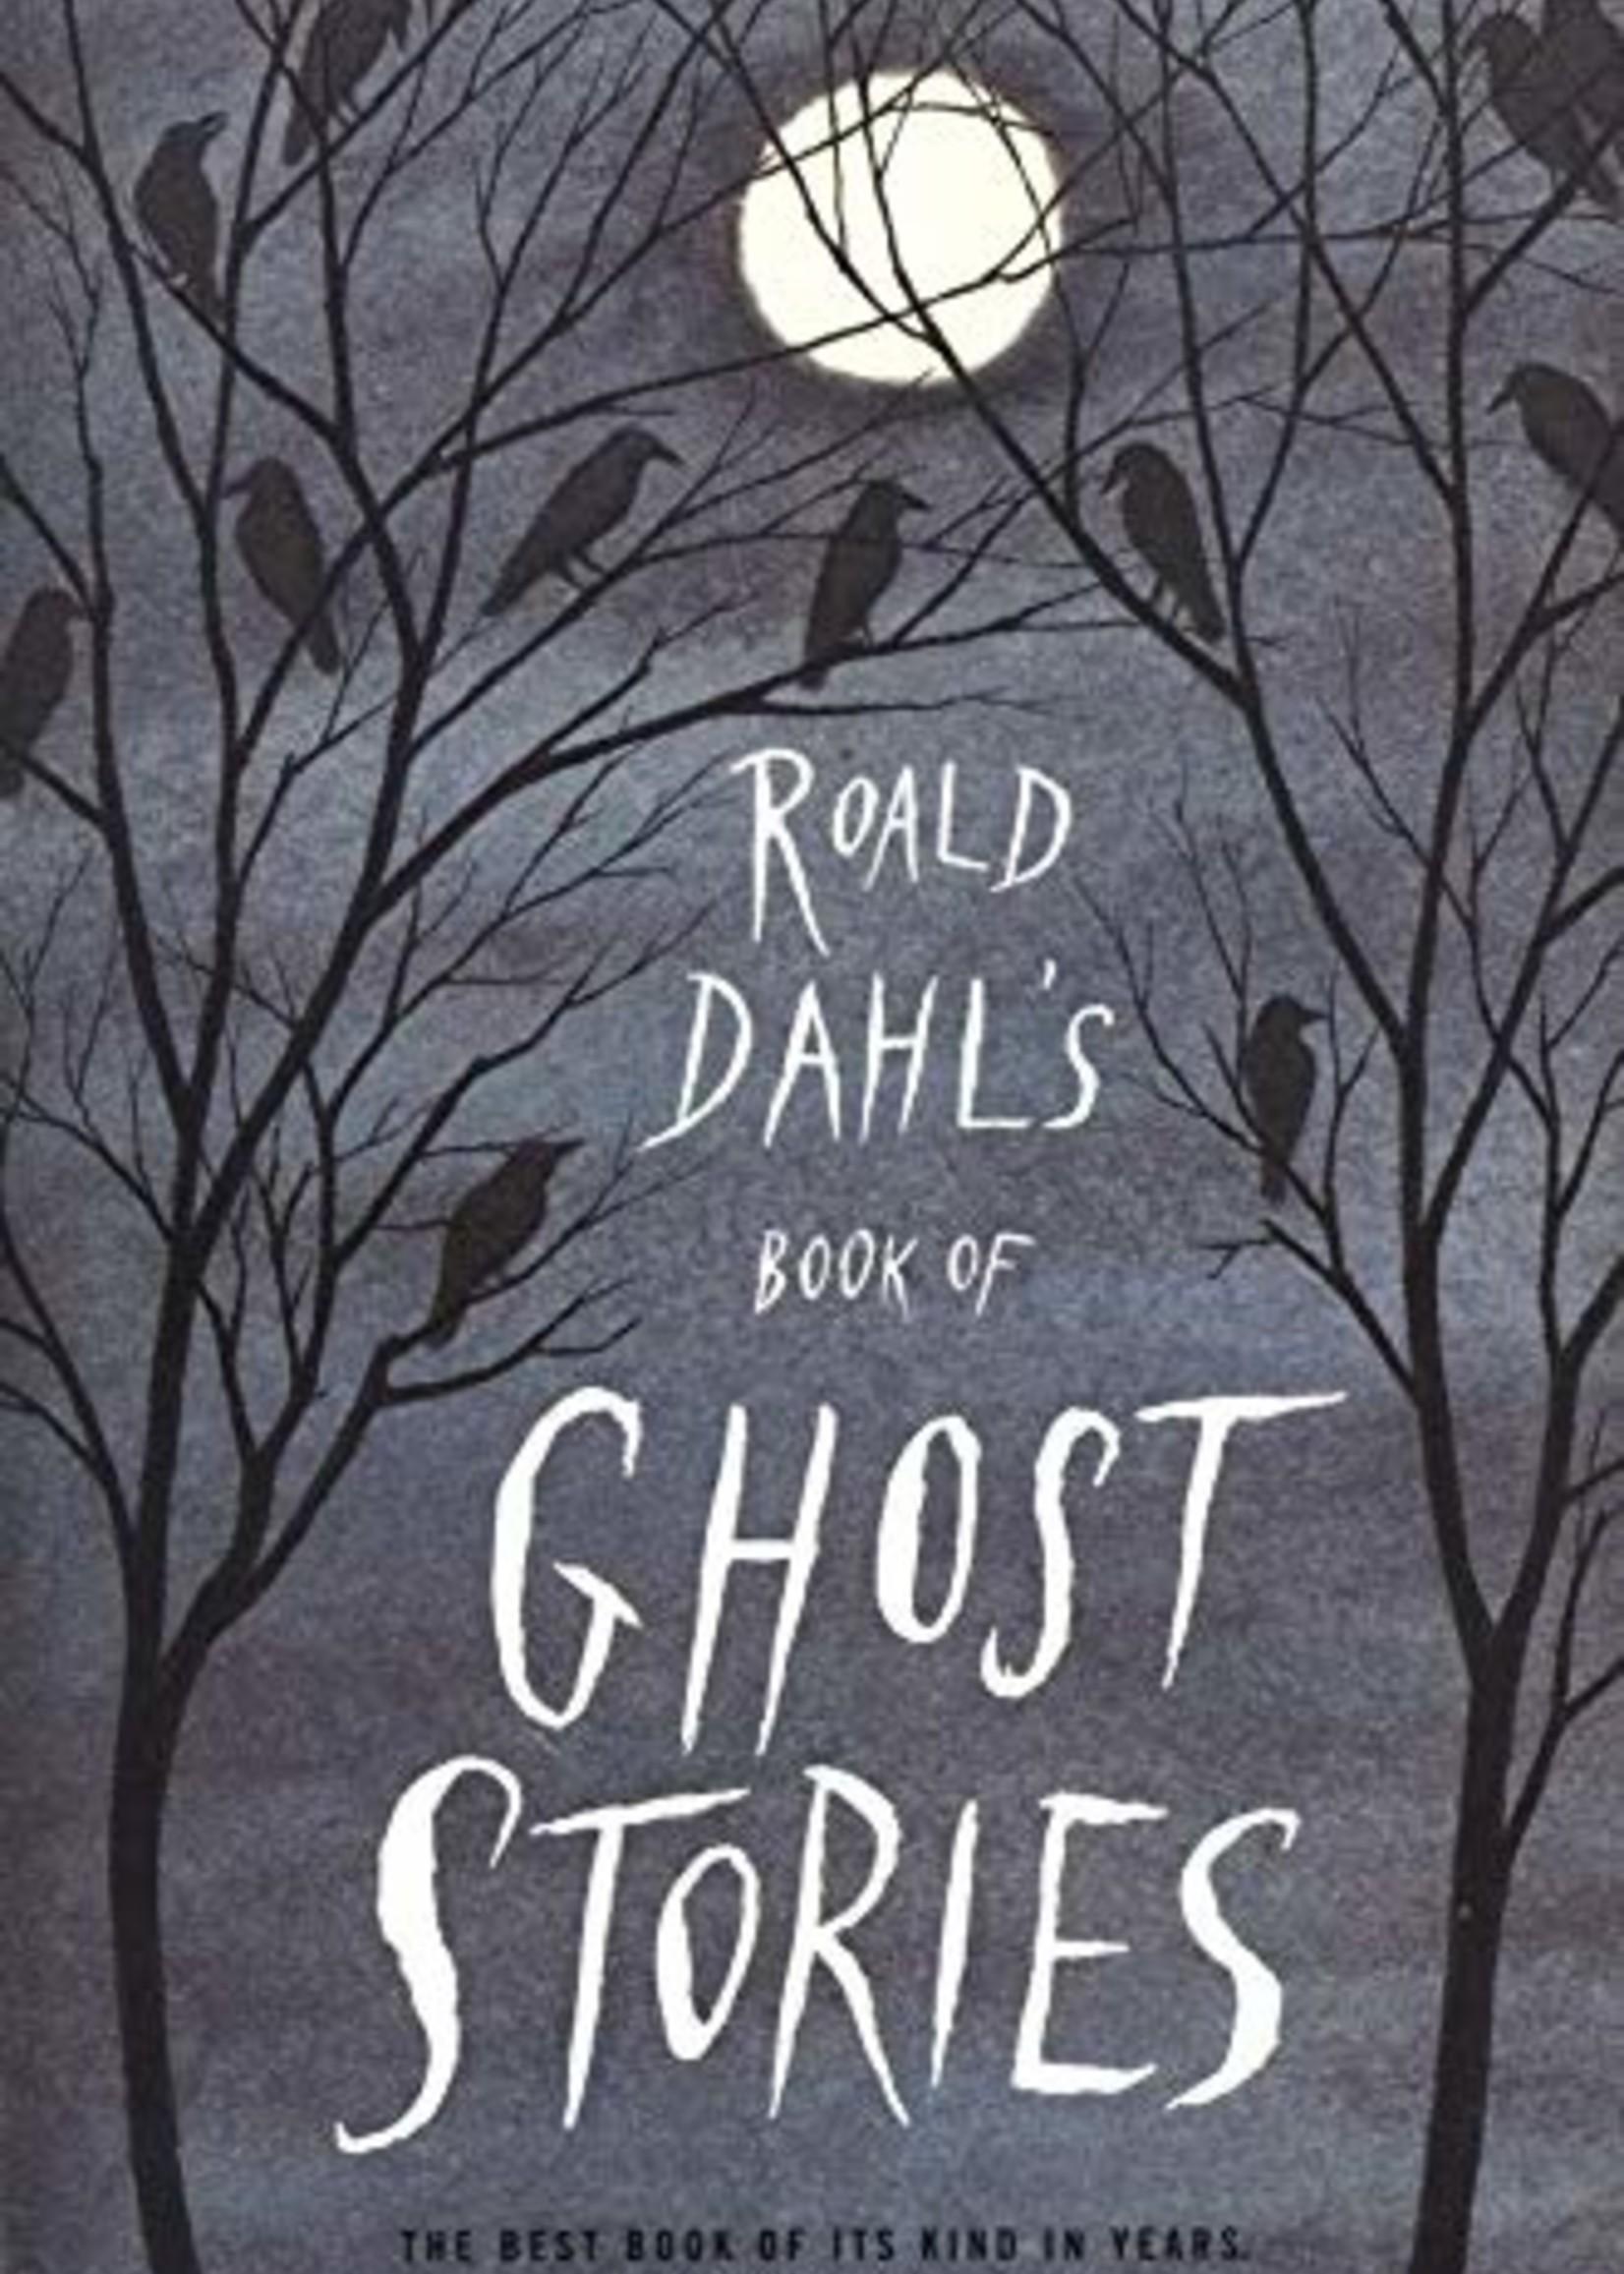 Roald Dahl's Book of Ghost Stories - Paperback